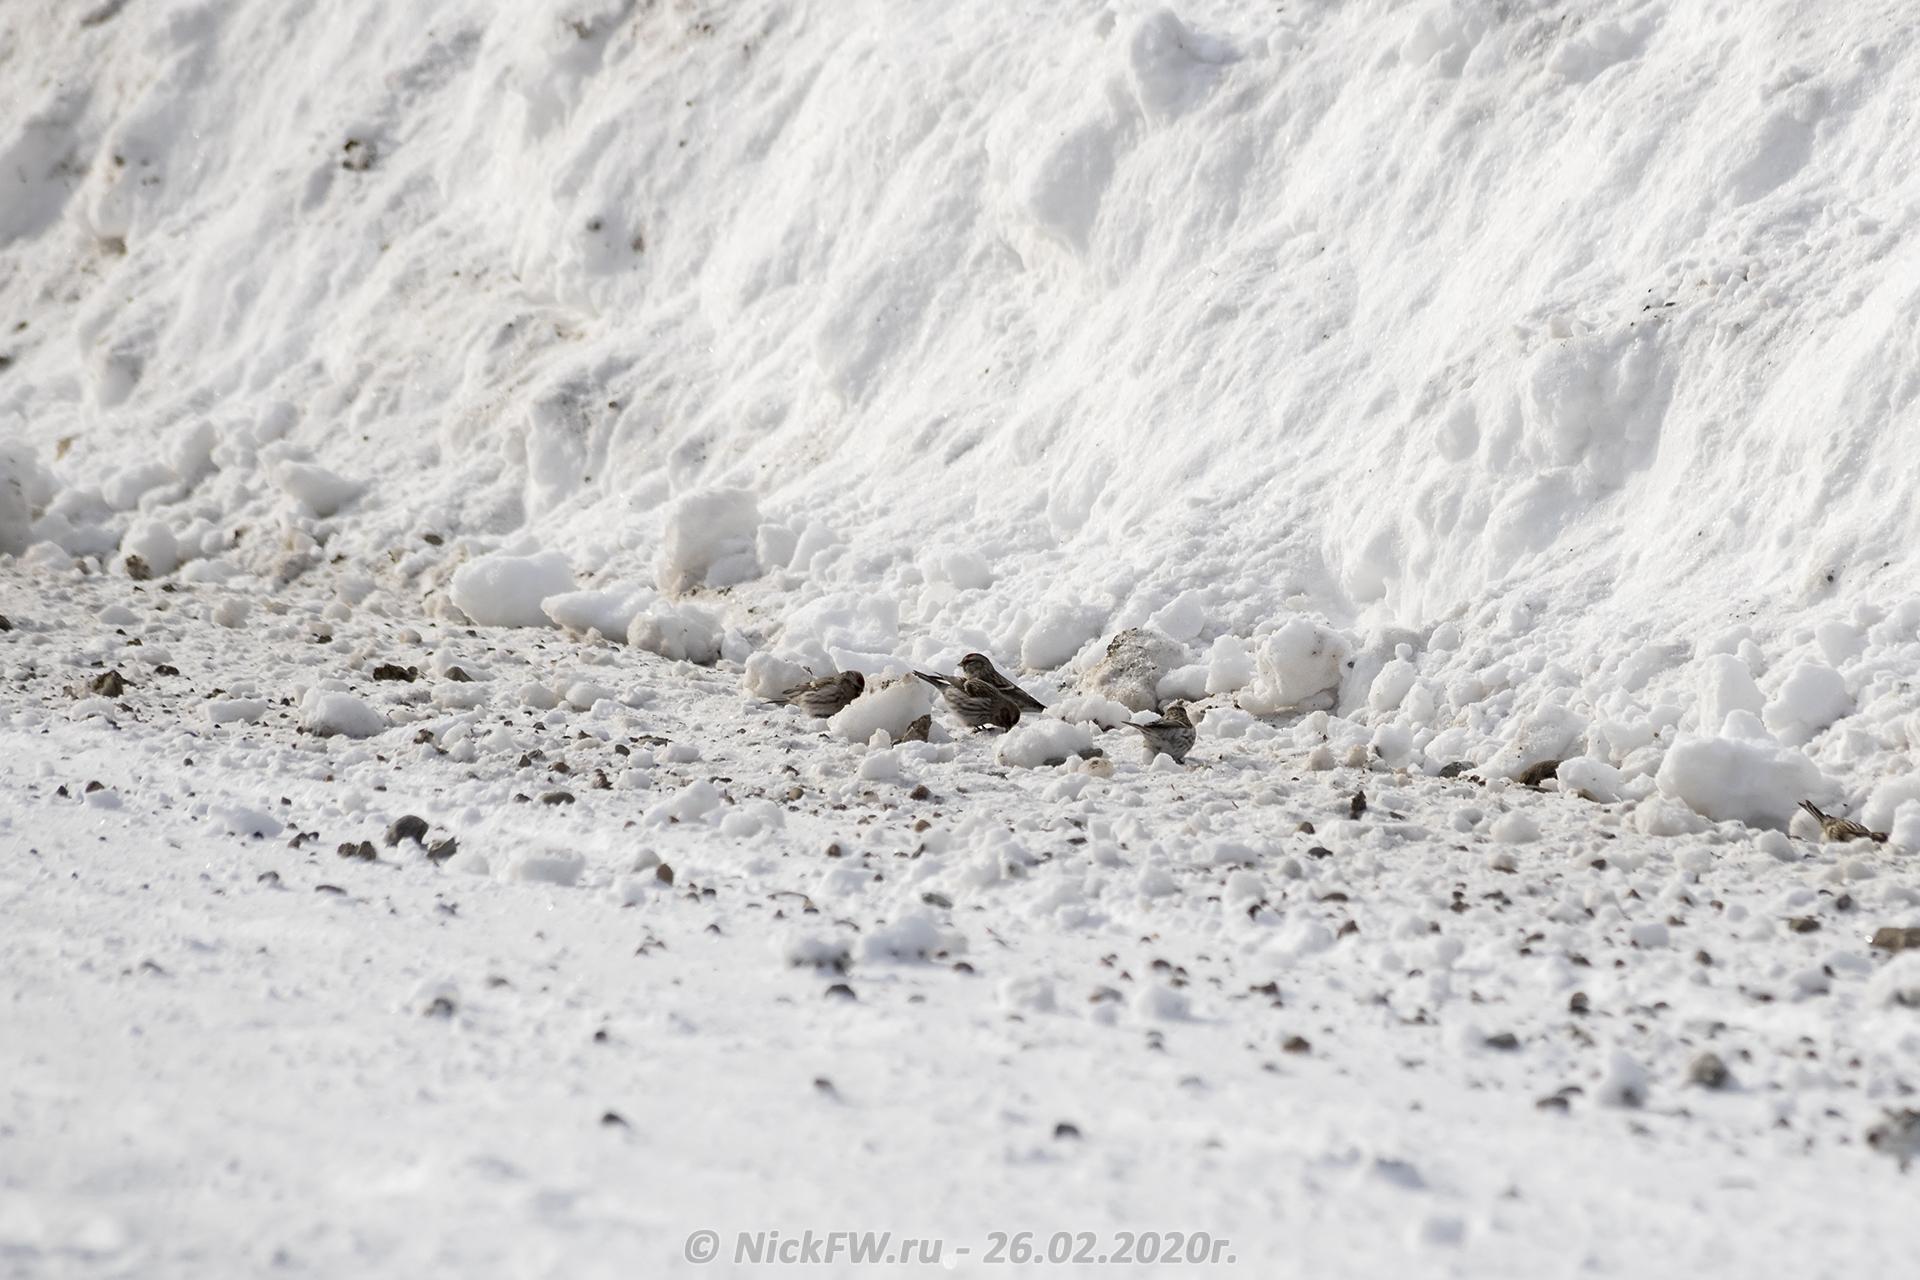 5. Чечётки на обочине © NickFW.ru - 26.02.2020г.